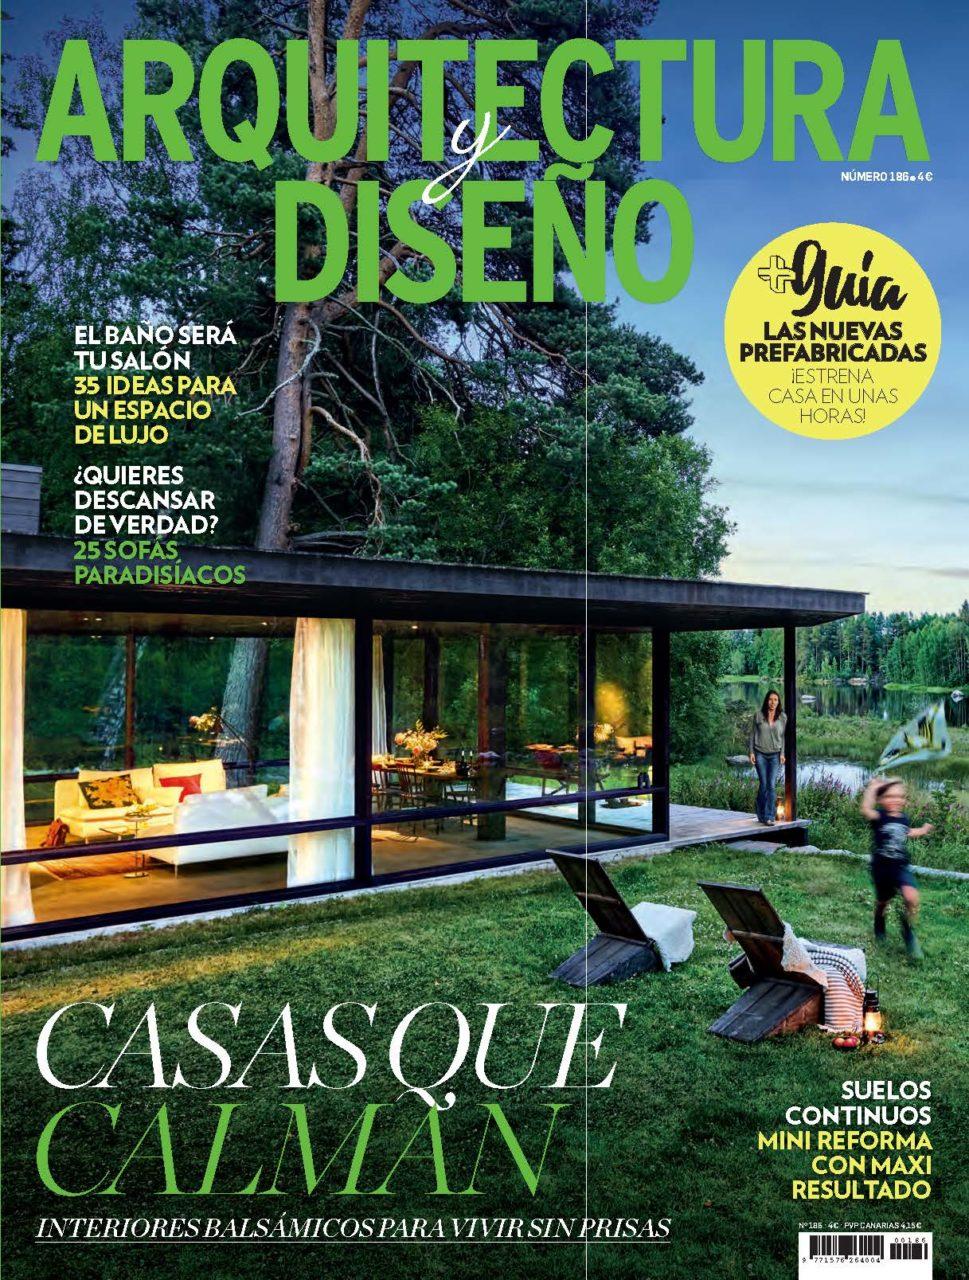 https://www.saota.com/wp-content/uploads/2019/04/2017_08_28_ES_Arquitectura_Mosman_Page_01.jpg